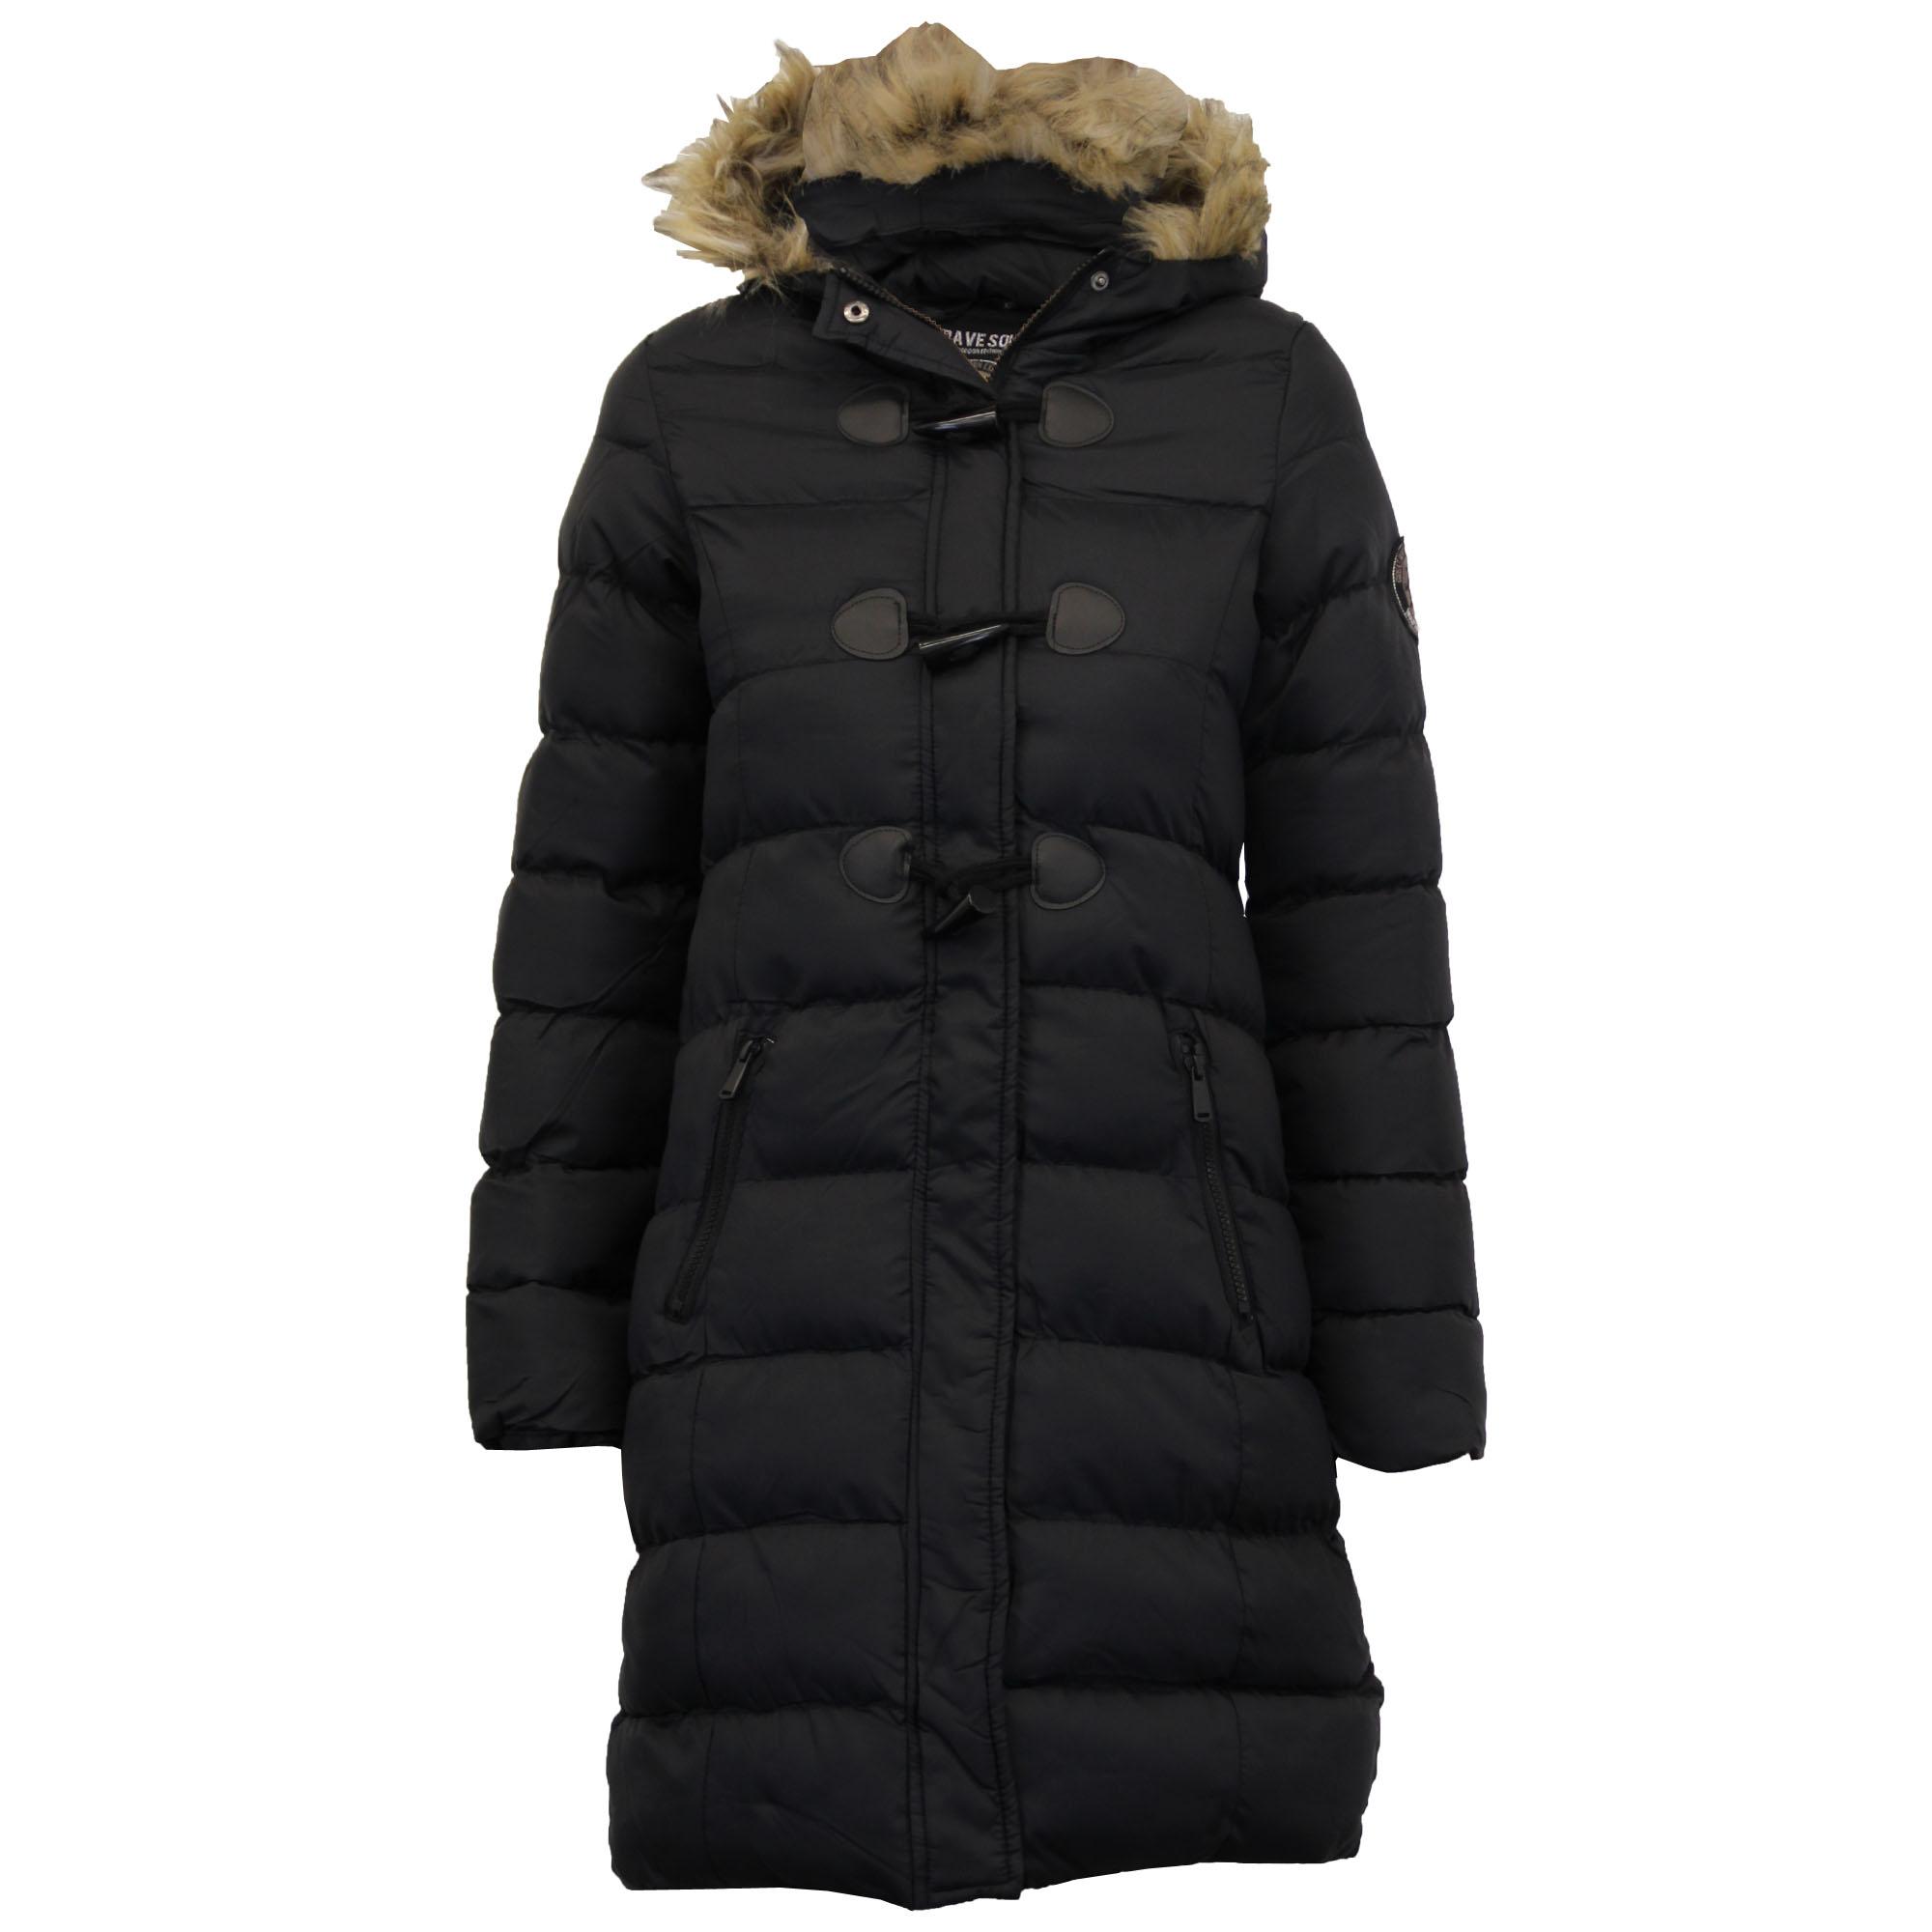 ladies long parka bubble jacket brave soul womens coat. Black Bedroom Furniture Sets. Home Design Ideas